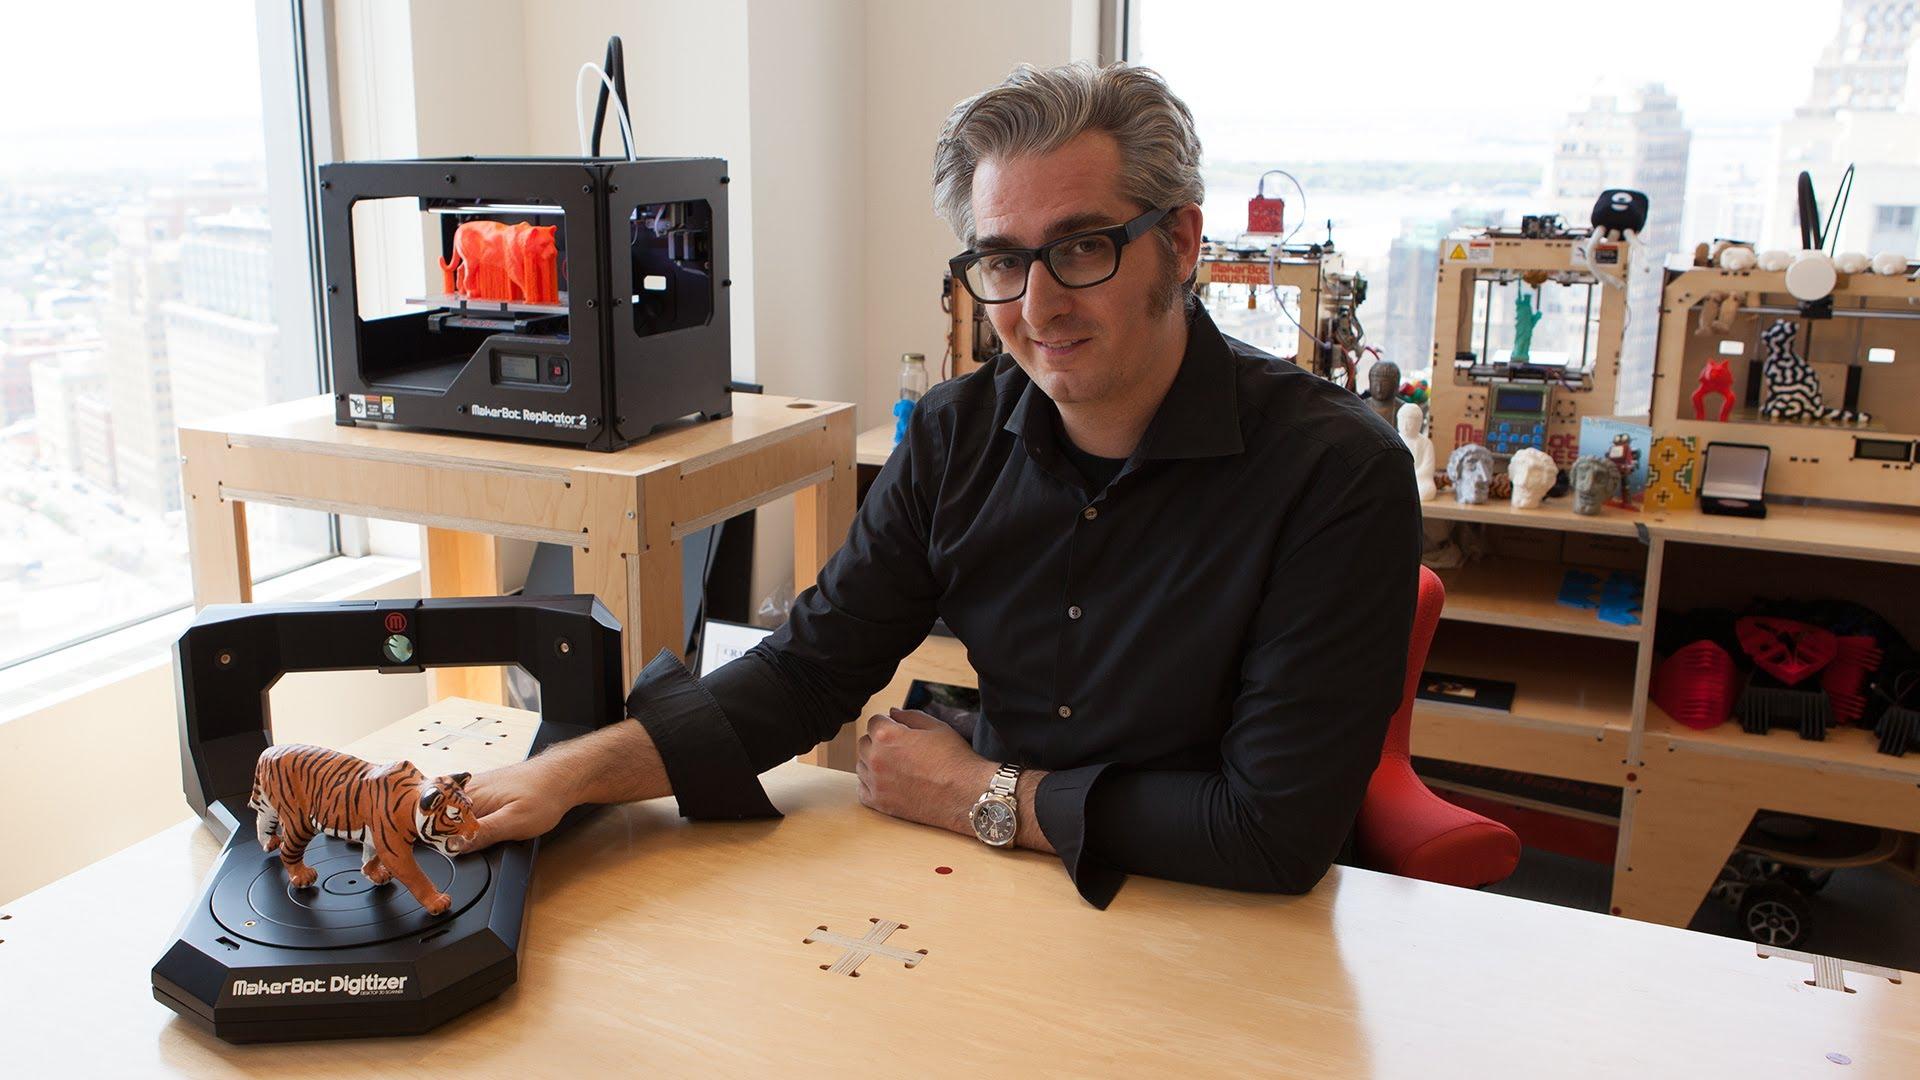 MakerBot Digitizer Desktop 3D Scanner Launches #3DThursday #3DPrinting